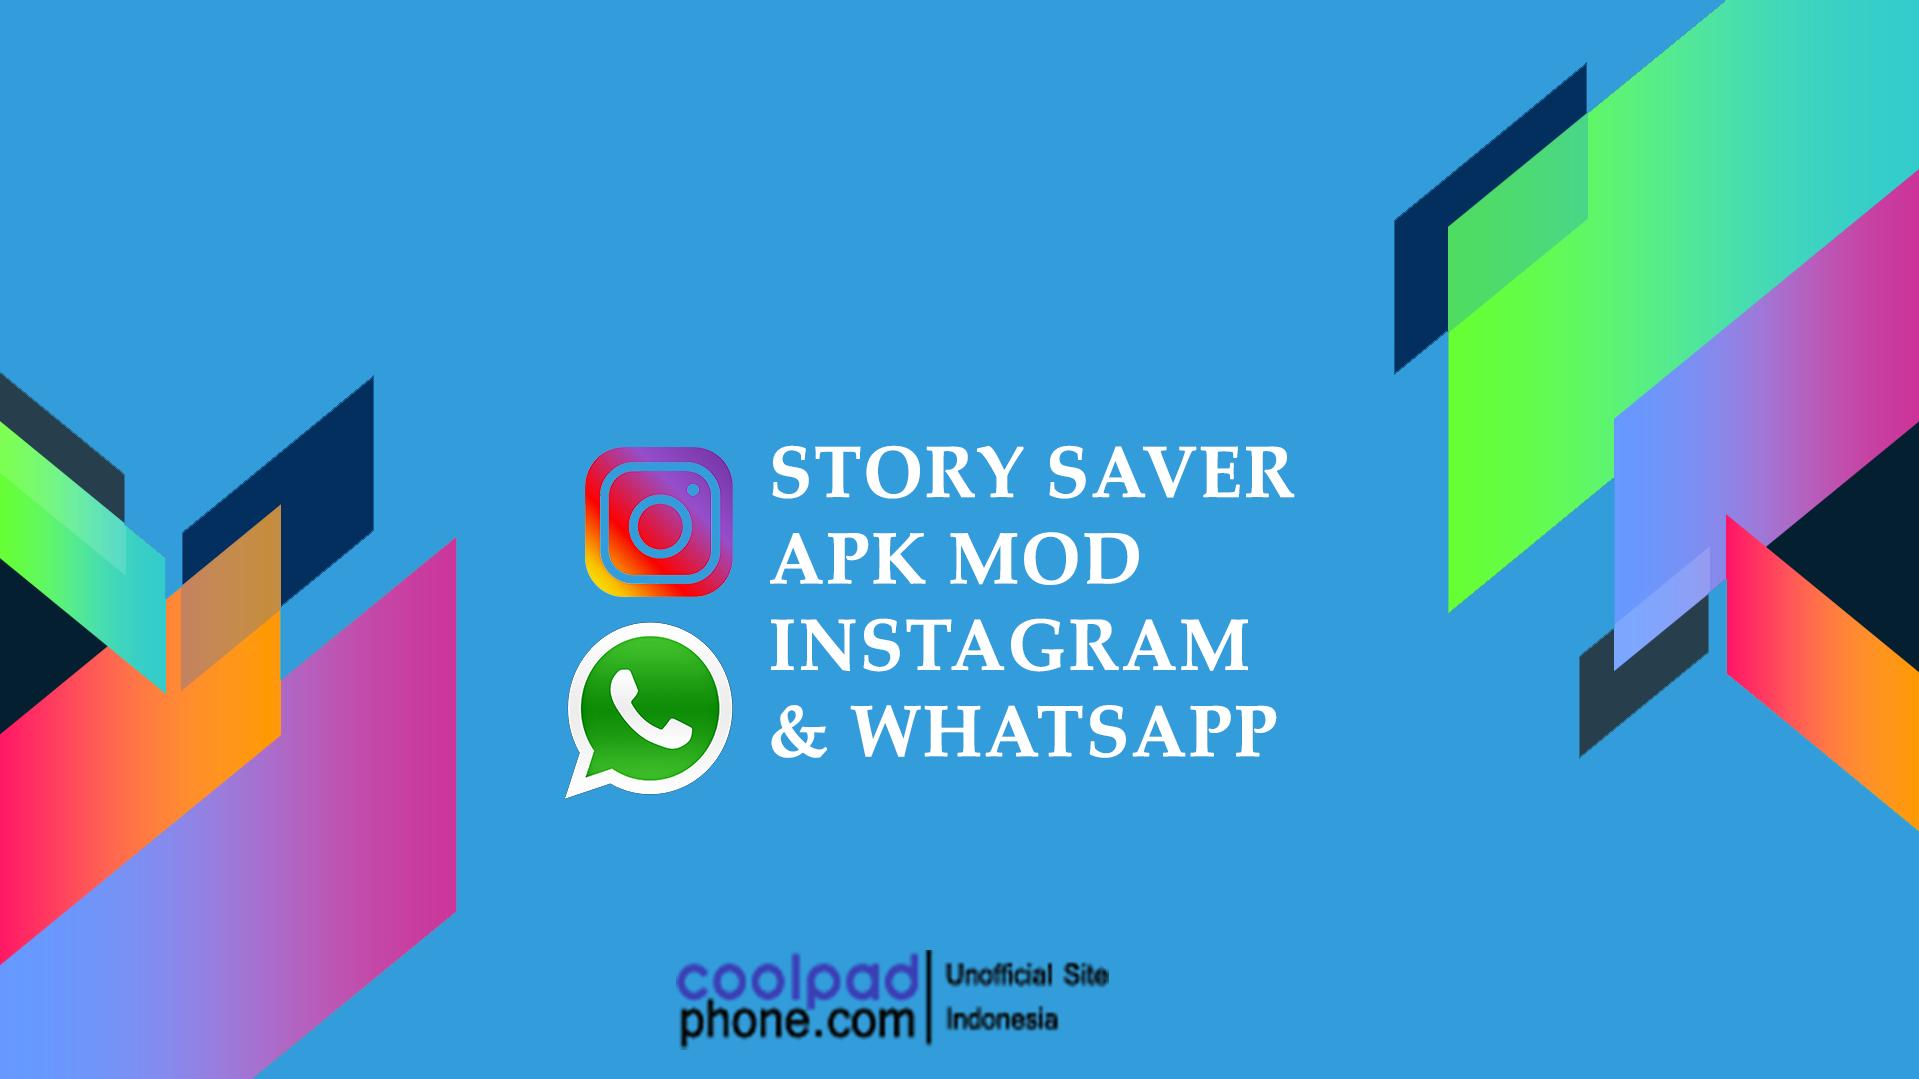 Story Saver APK MOD Instagram dan Whatsapp